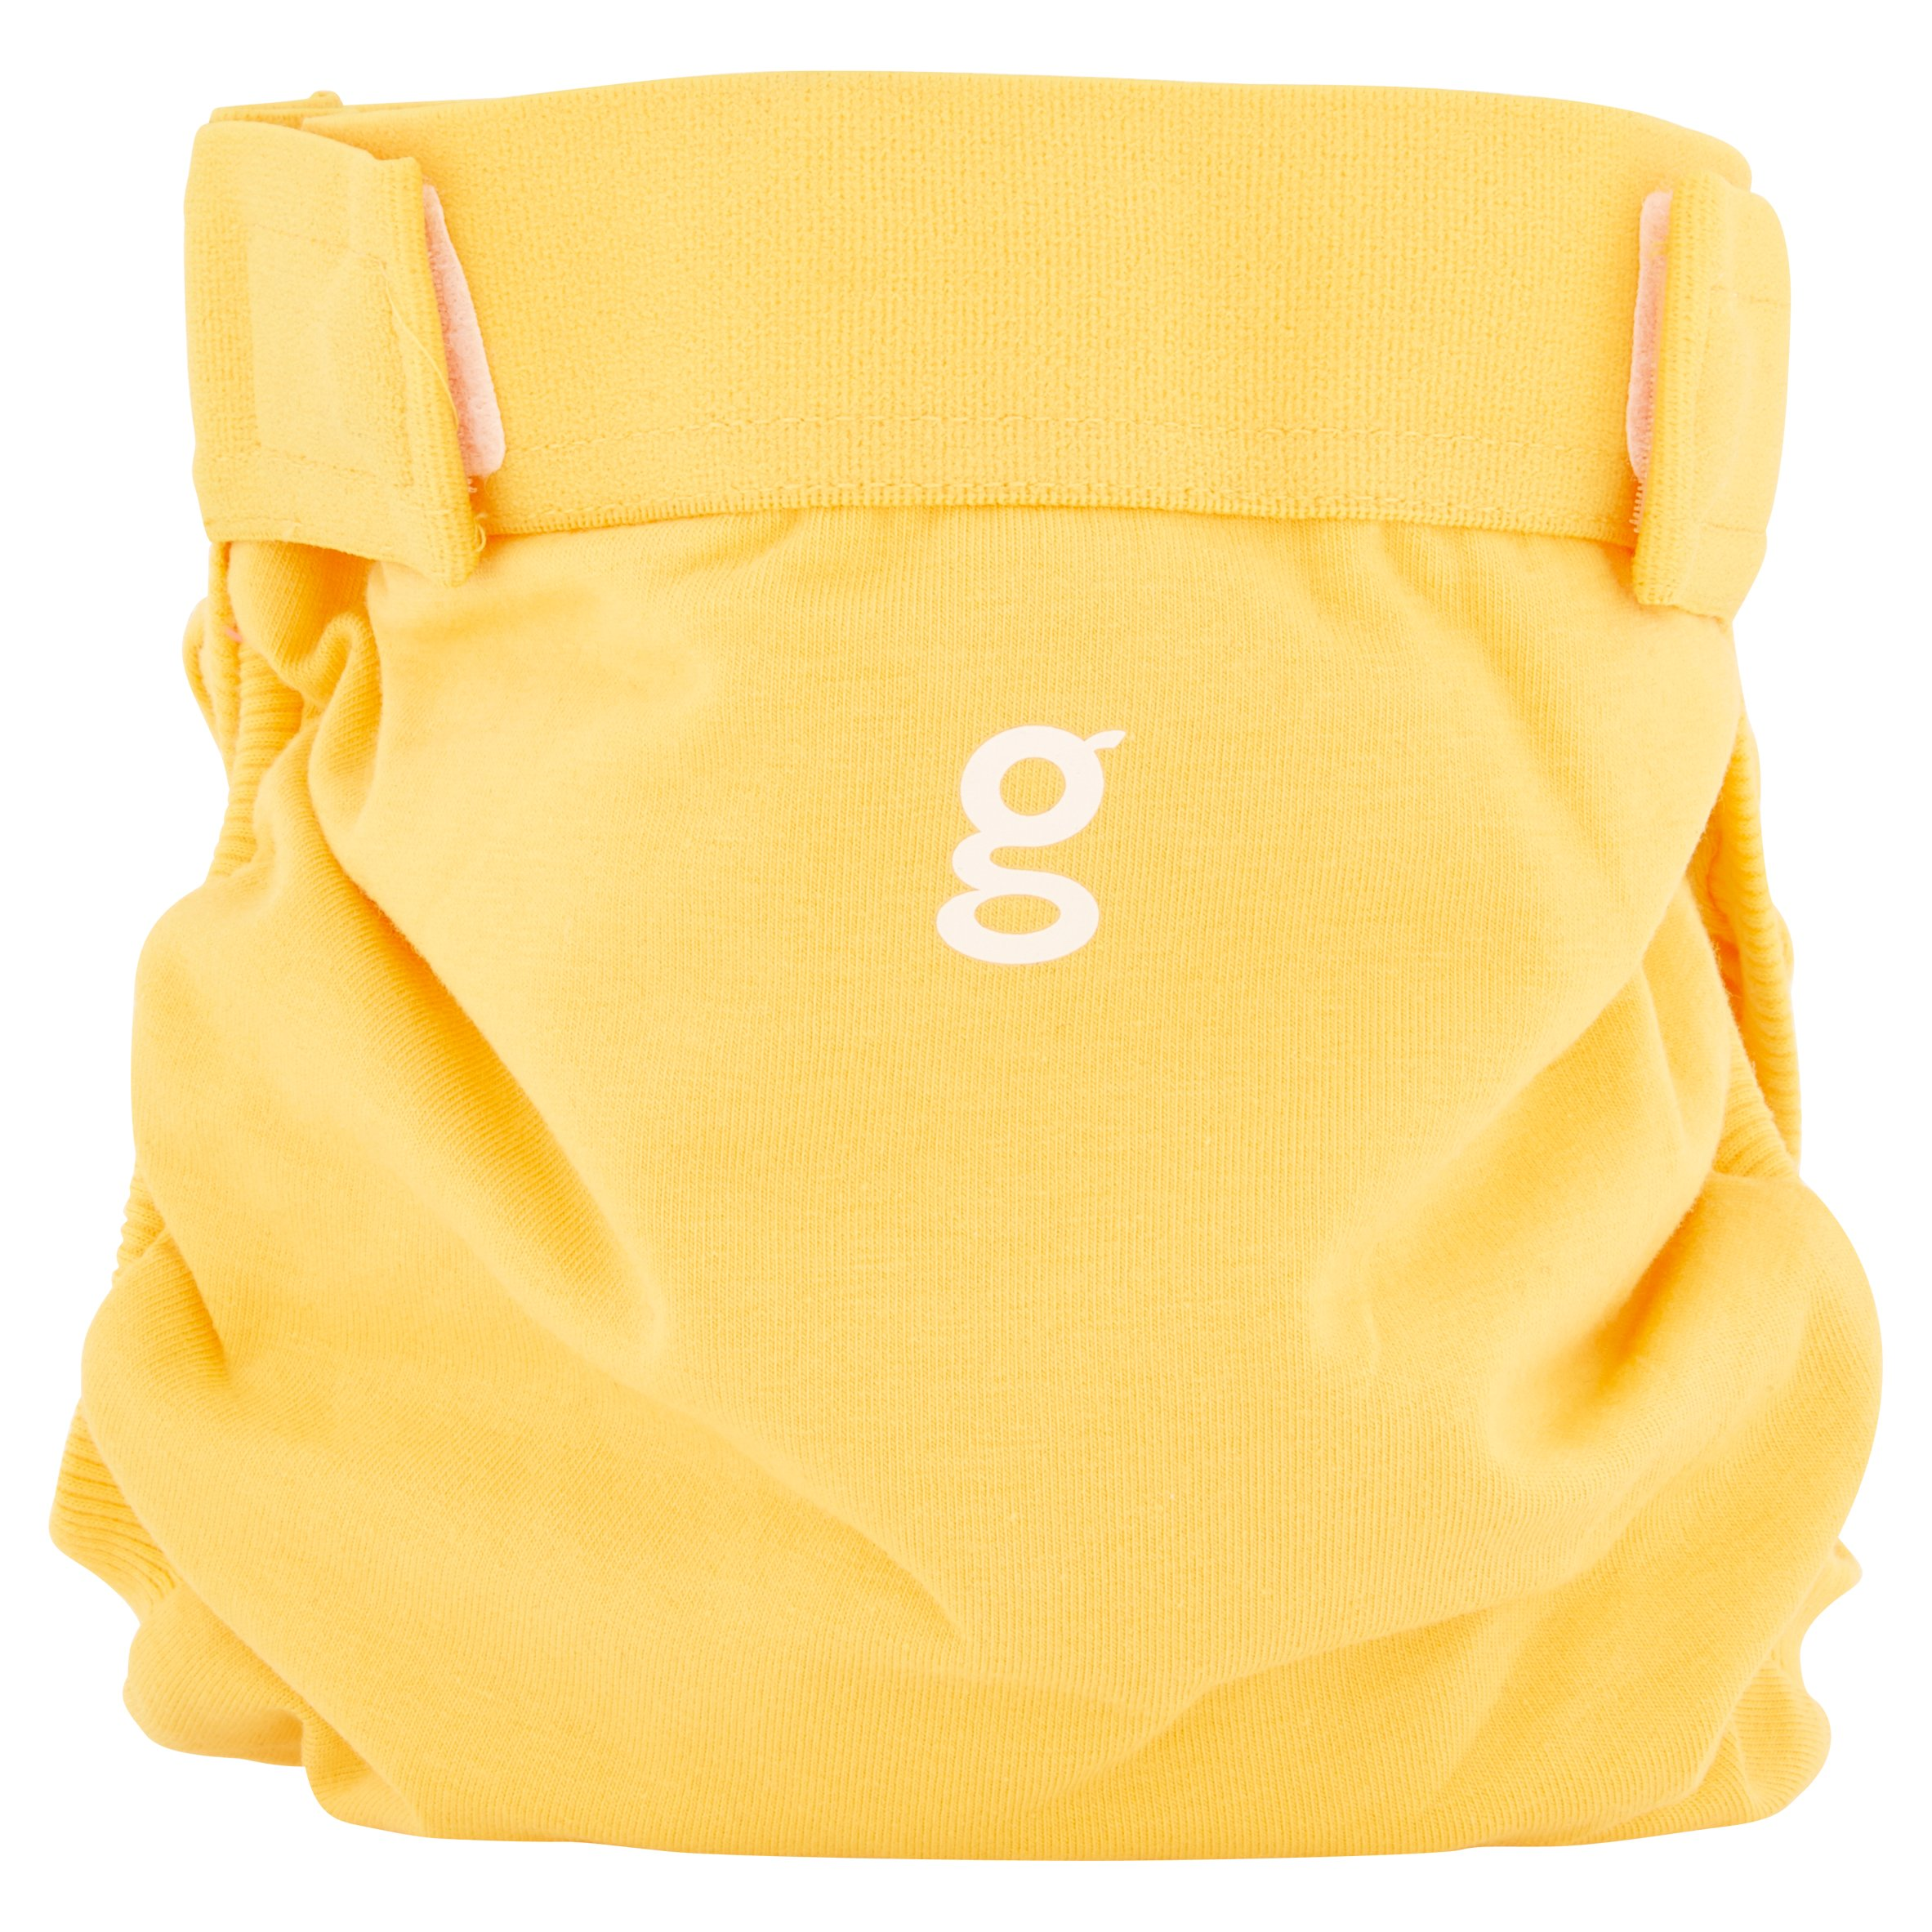 gDiapers gPants Medium Reusable Diaper Covers 13-28 lbs ...